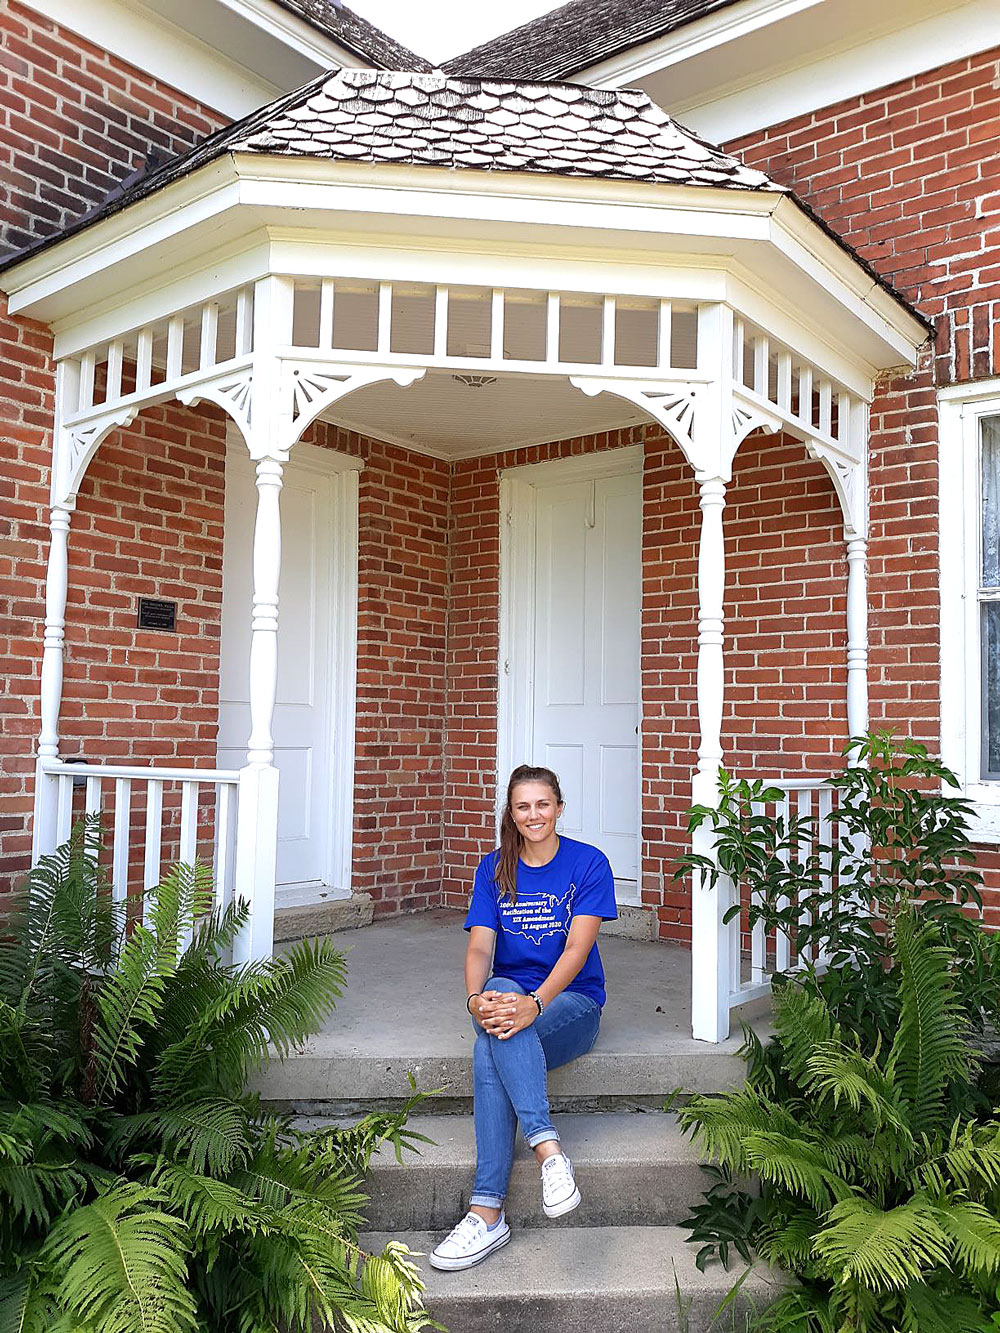 Carrie Lane Chapman Catt Girlhood Home intern has summer unlike one she expected